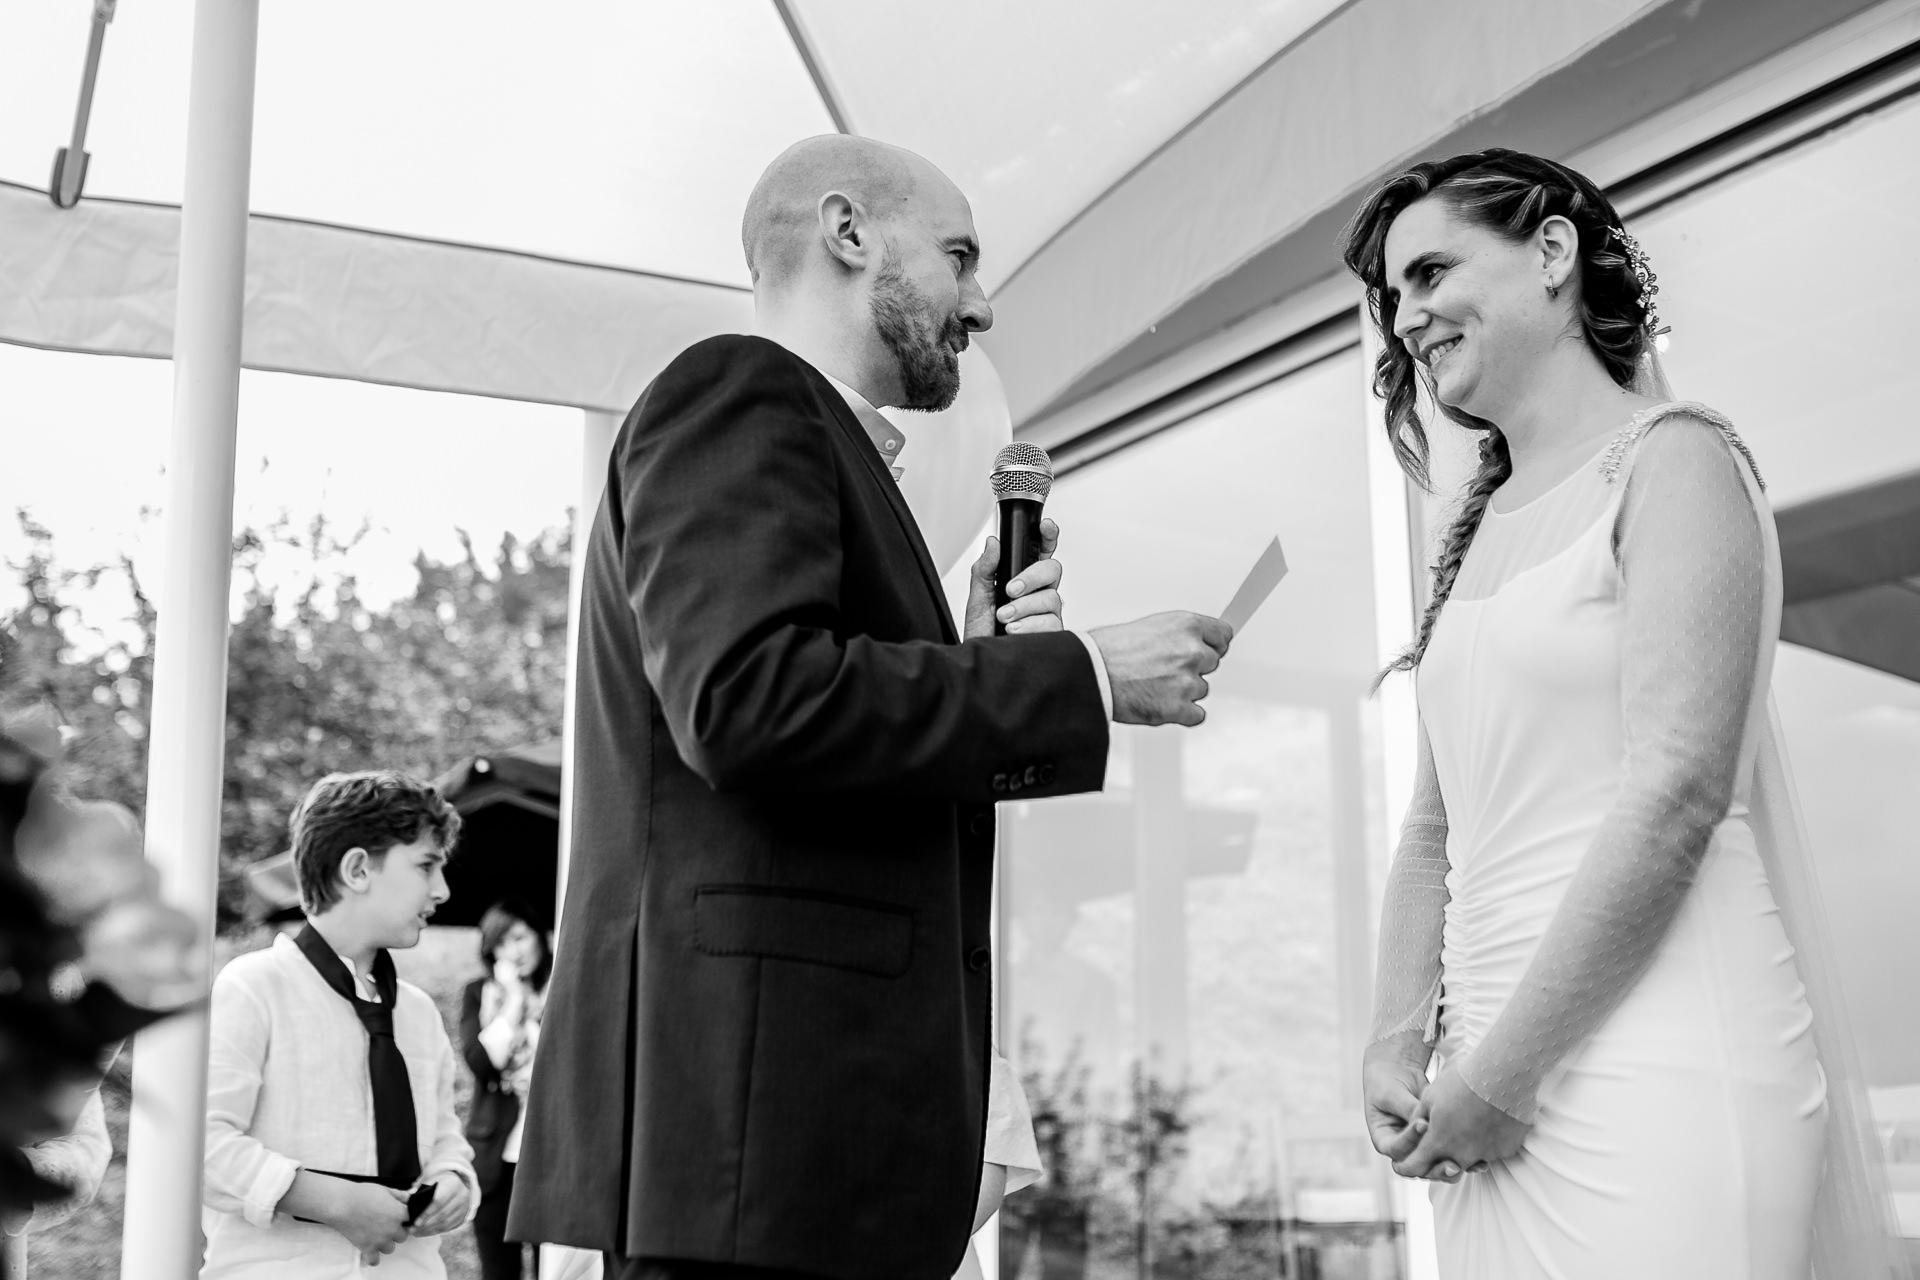 boda civil sagardotegi sidrería arizia zarautz 135558